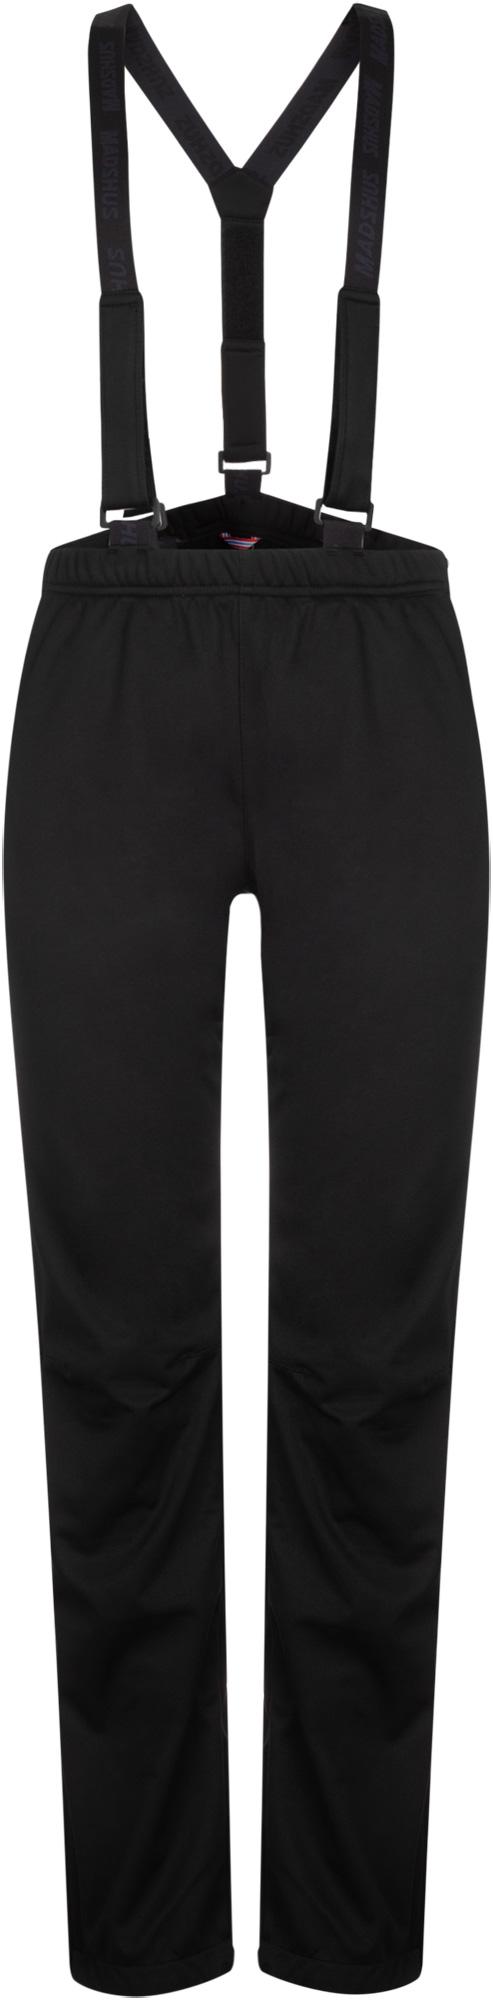 Madshus Брюки женские Madshus, размер 46 брюки женские oodji цвет серый 16700058 47883 2000z размер m 46